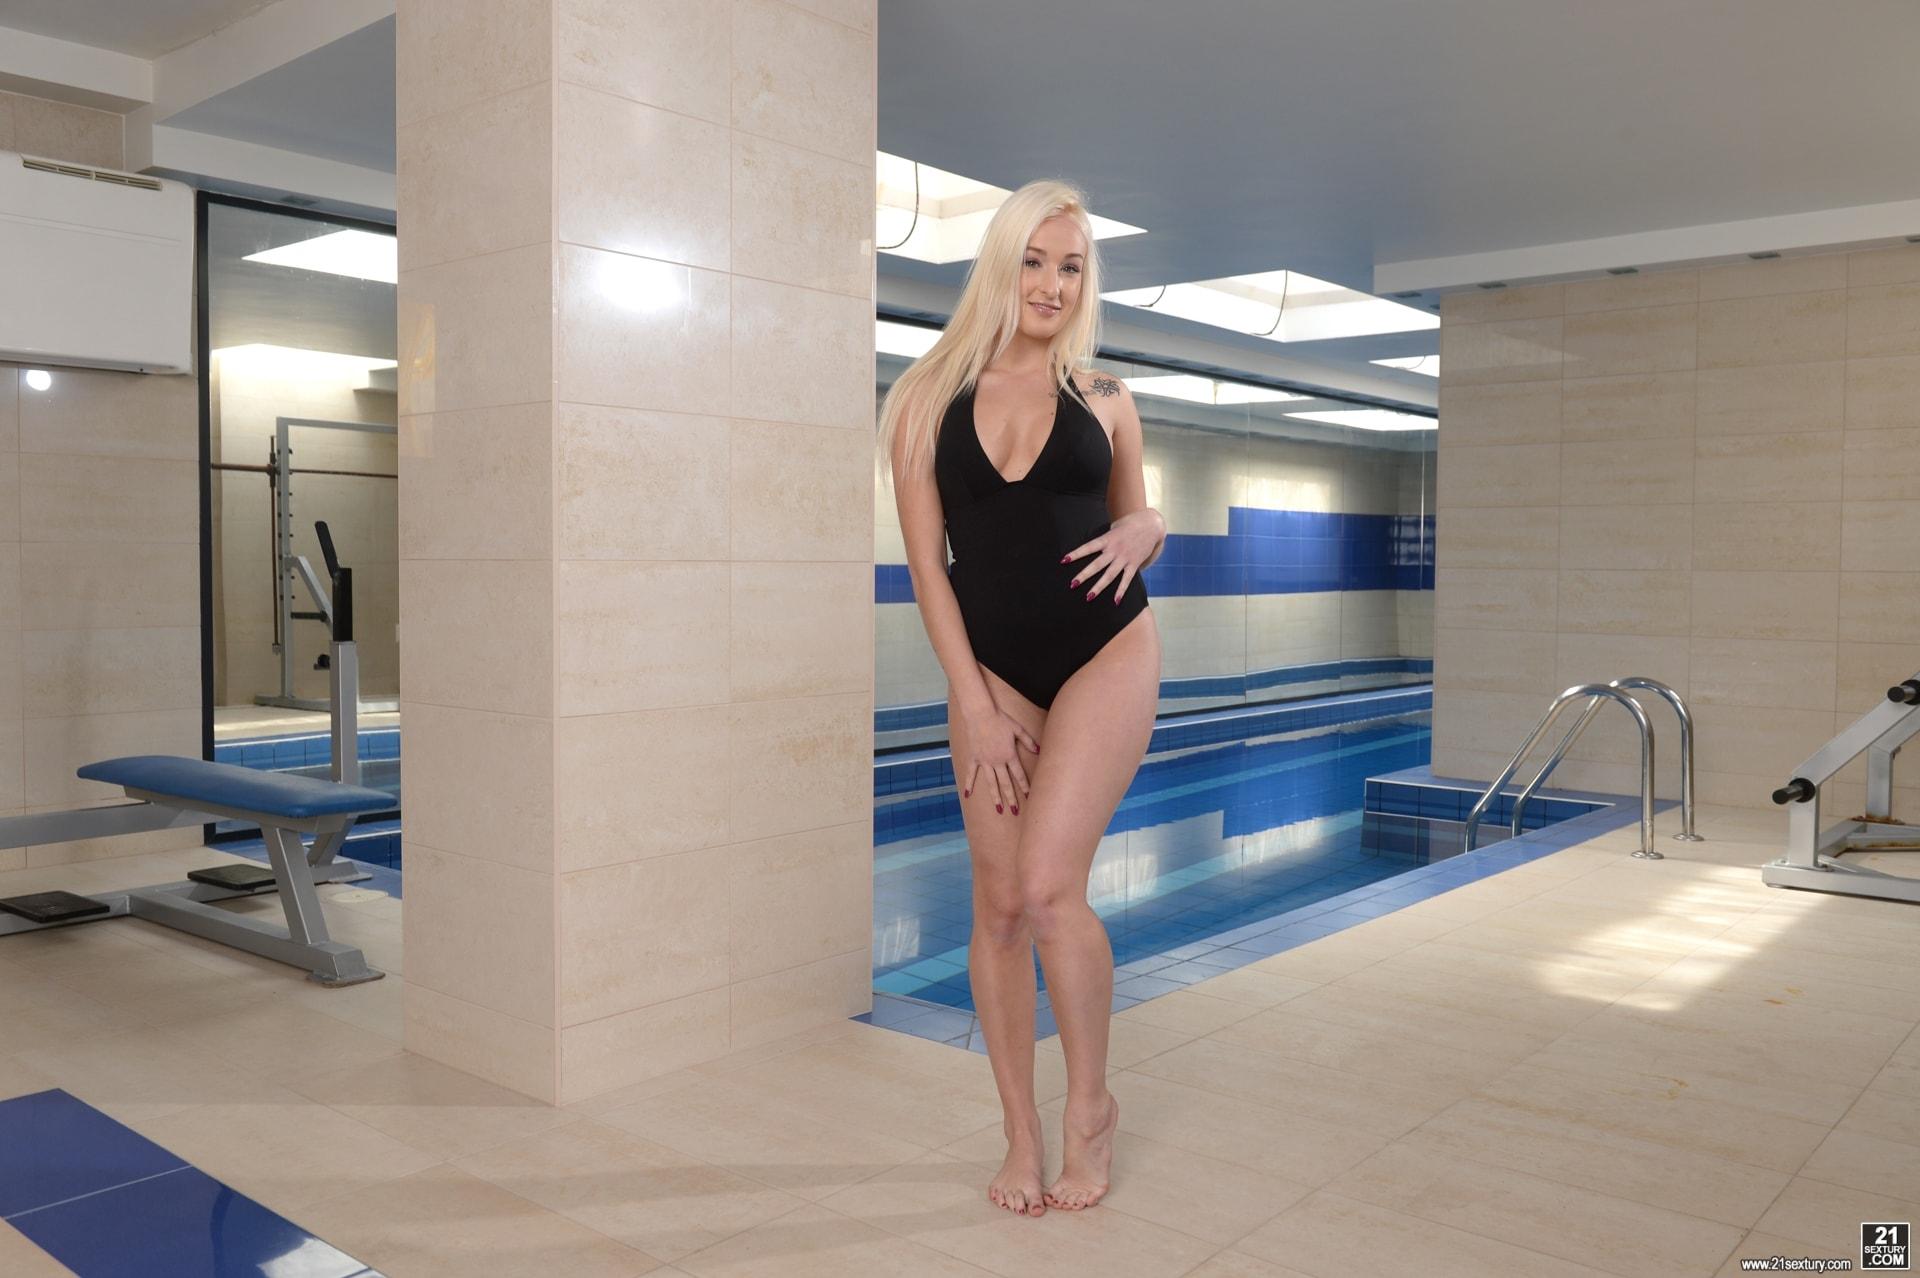 21Sextury 'Naughty Spa Pleasures' starring Daisy Lee (Photo 1)